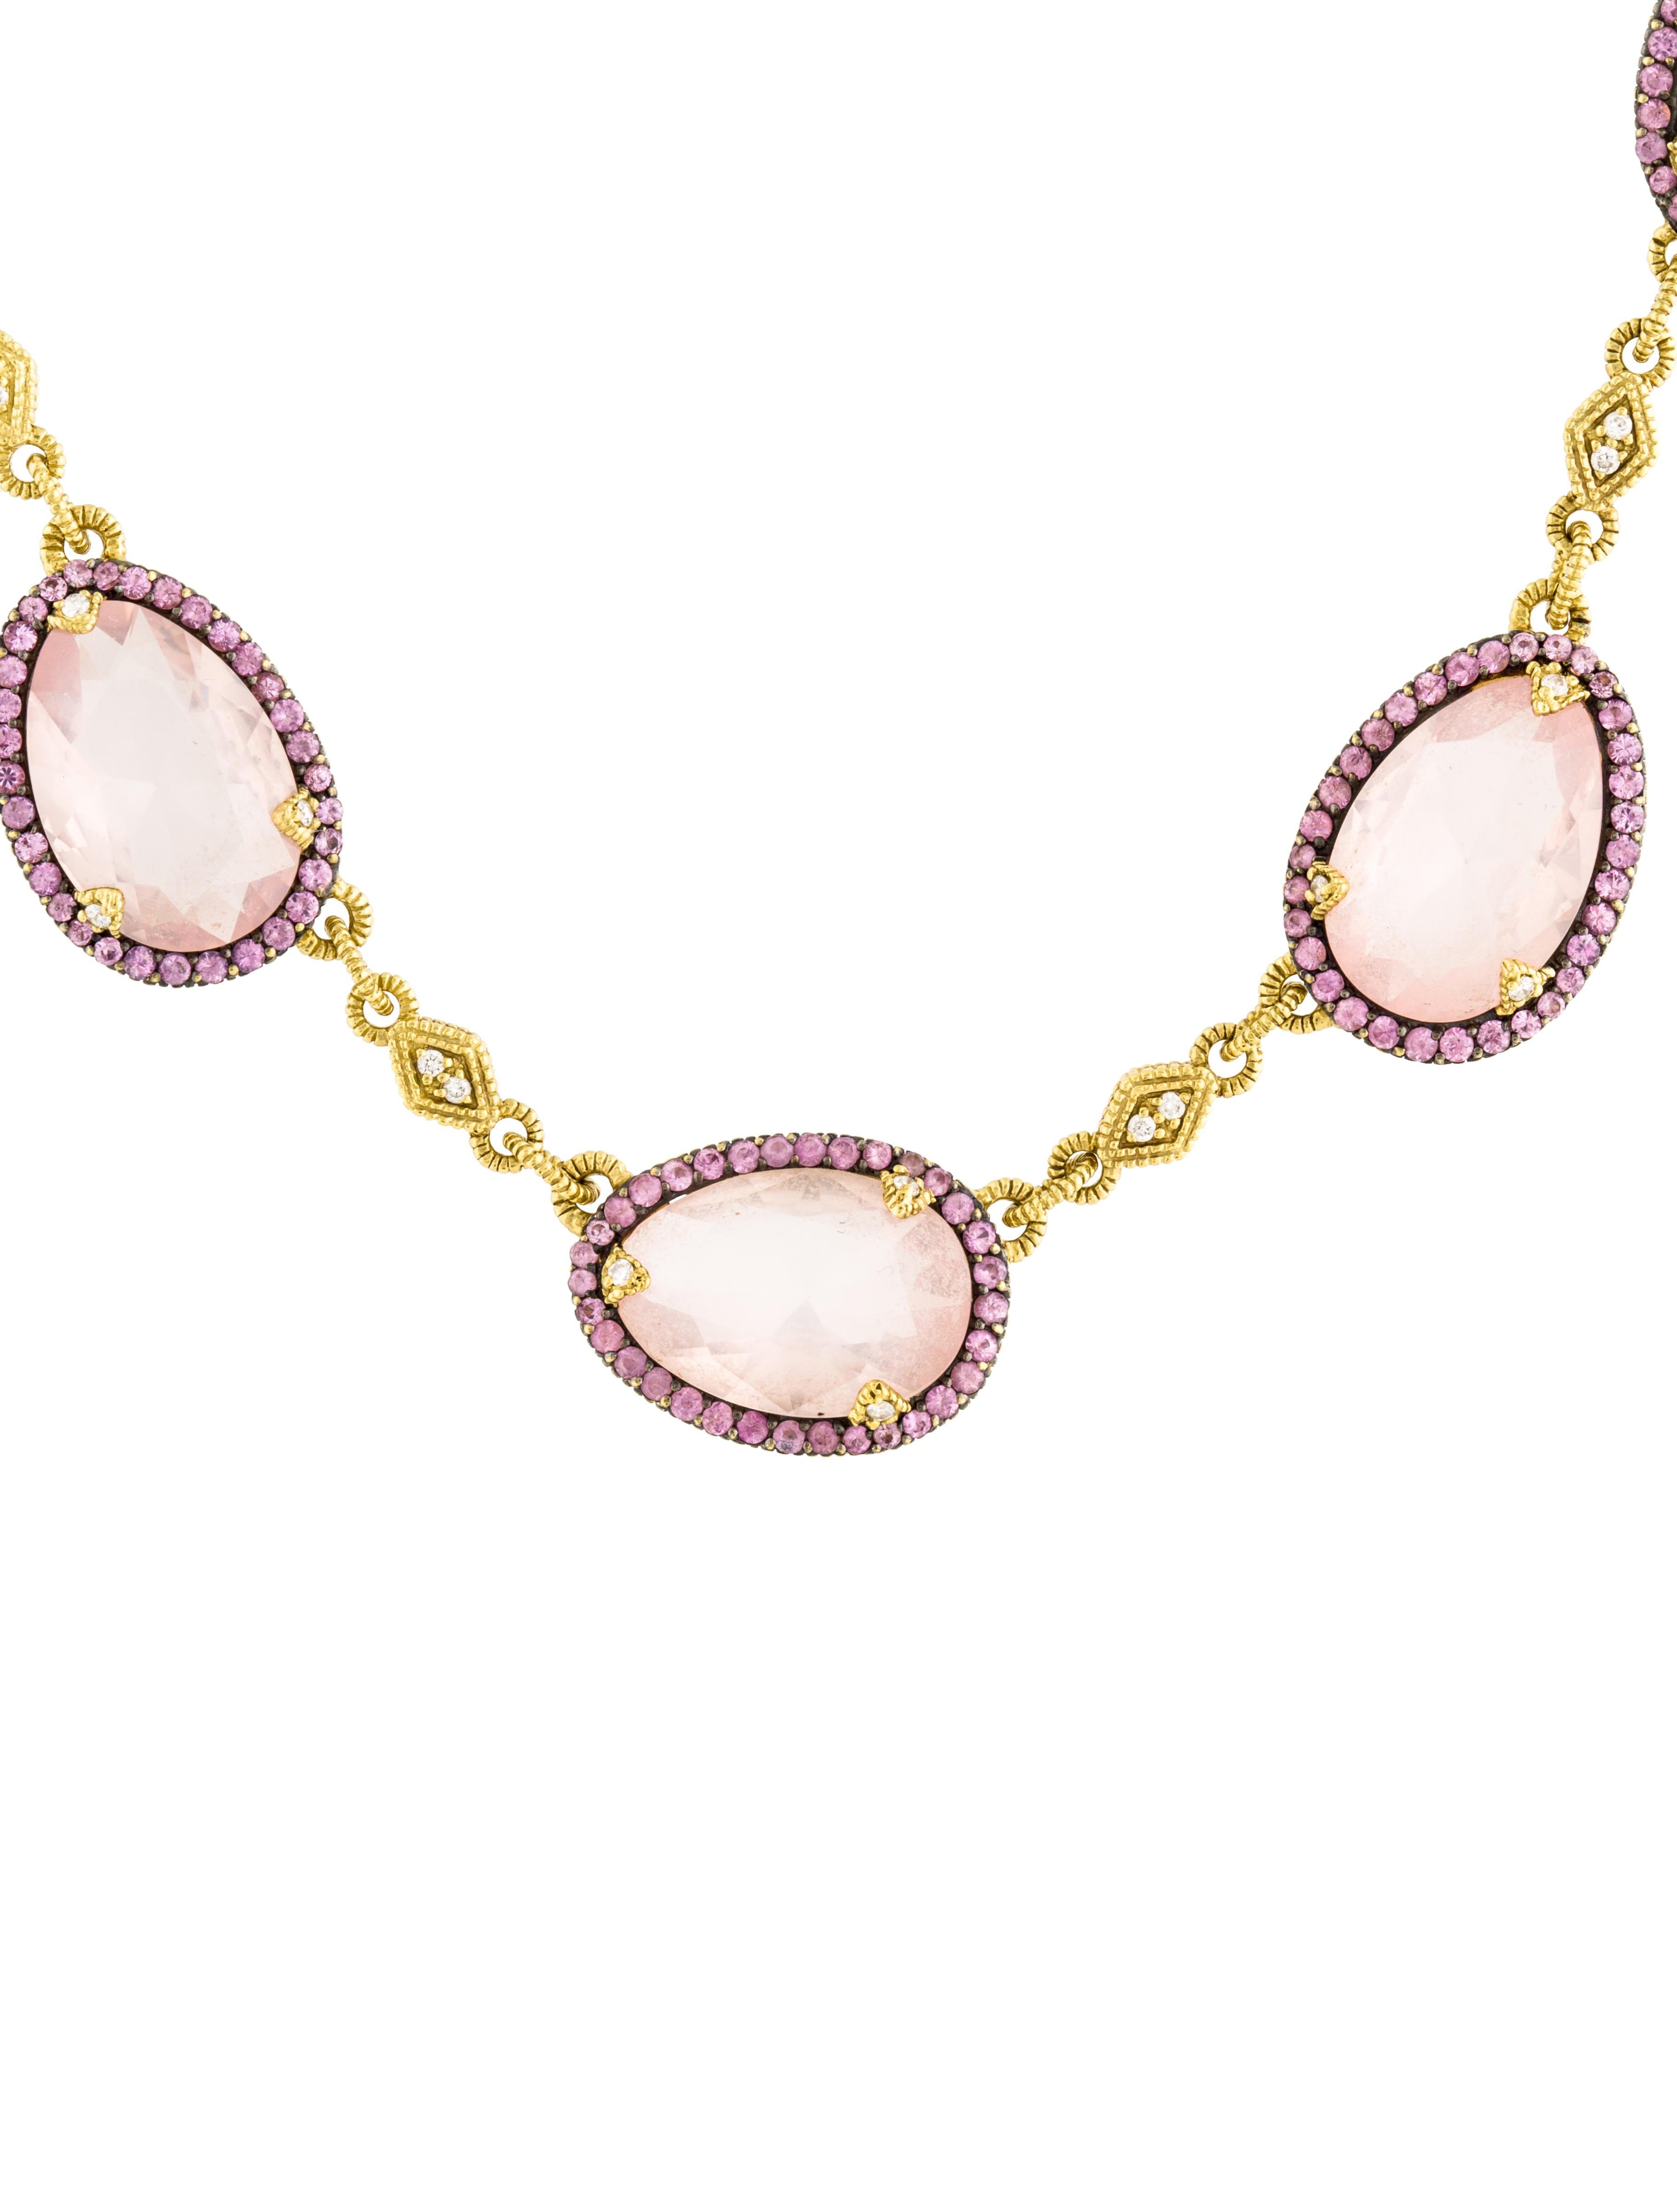 Judith Ripka 18K Rose Quartz Pink Sapphire & Diamond Station